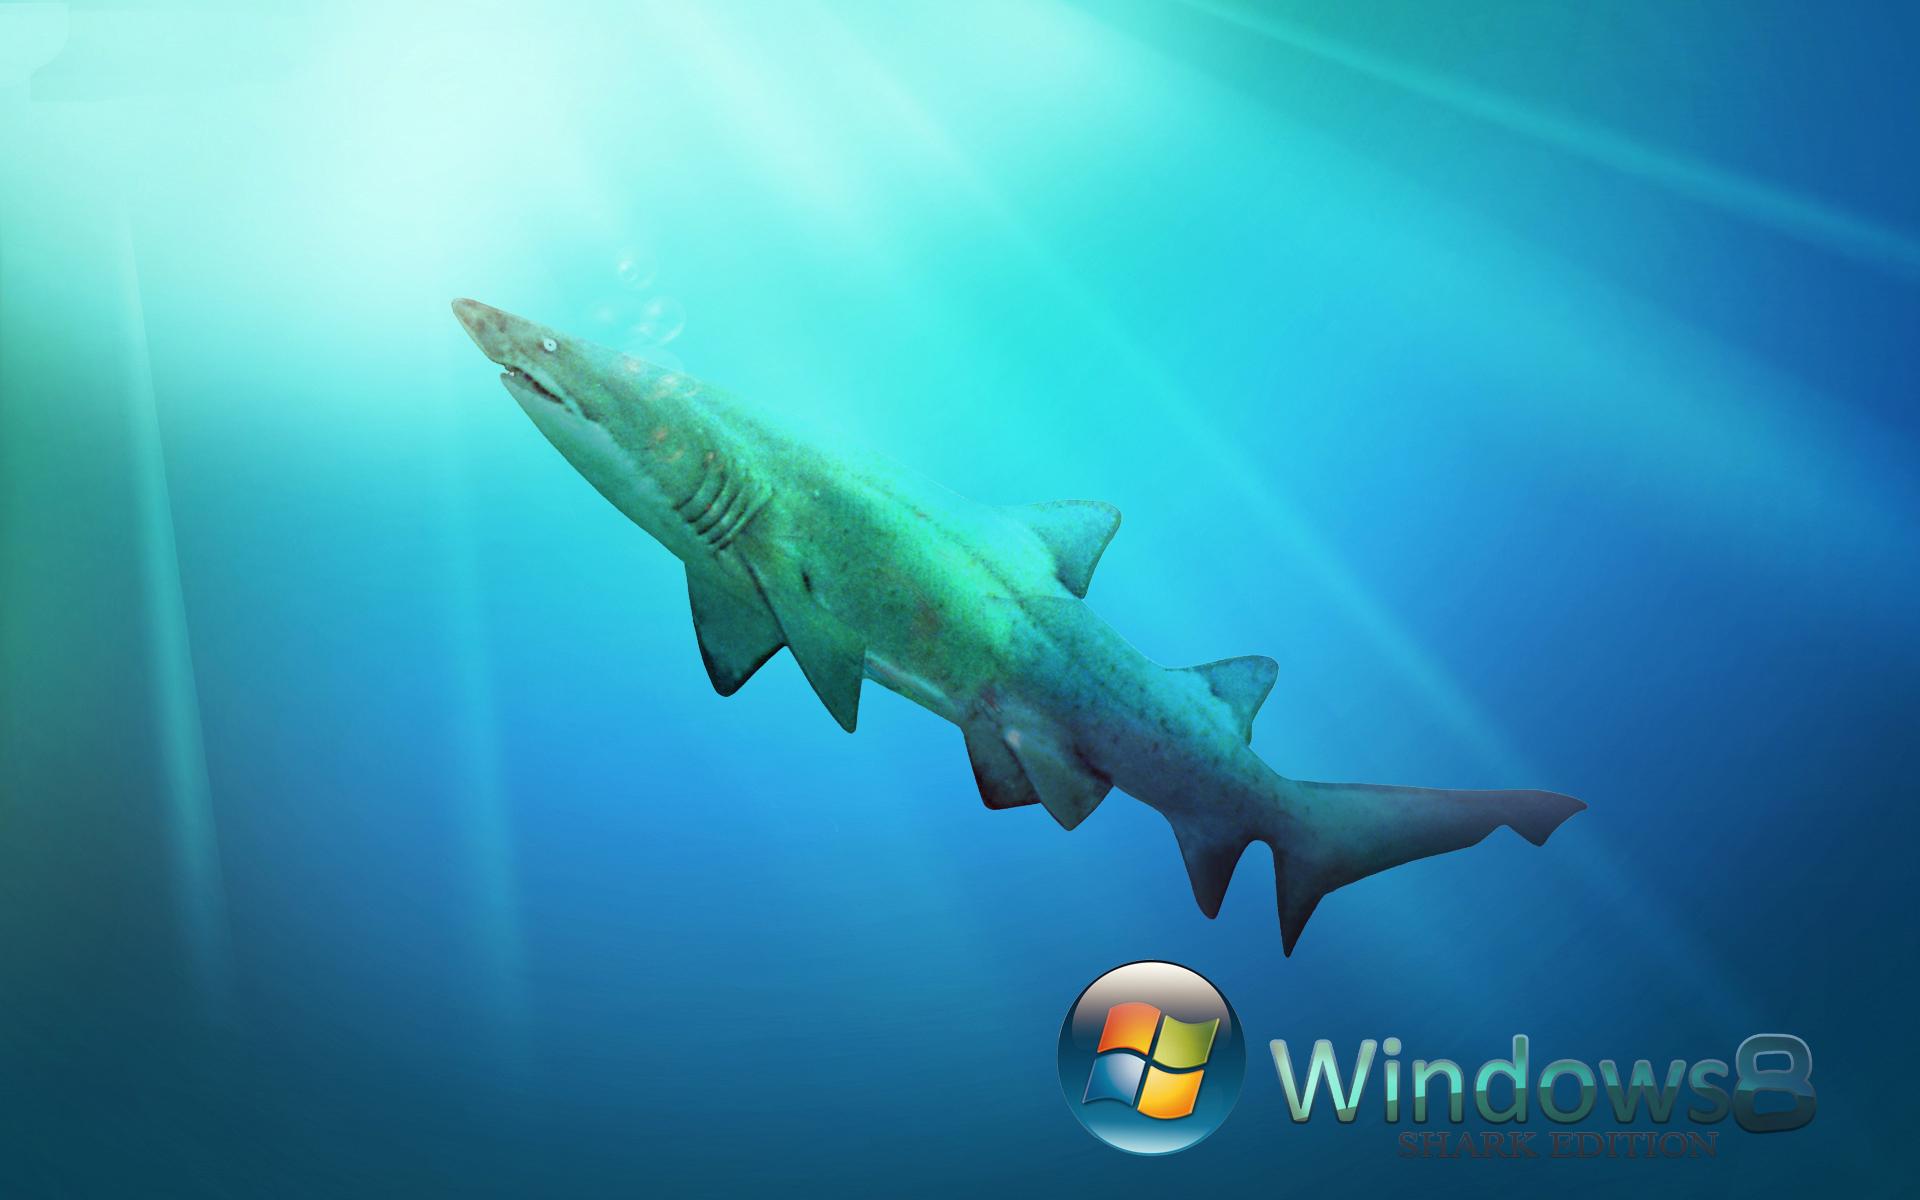 windows 8 official desktop wallpapers windows 8 black and blue desktop 1920x1200